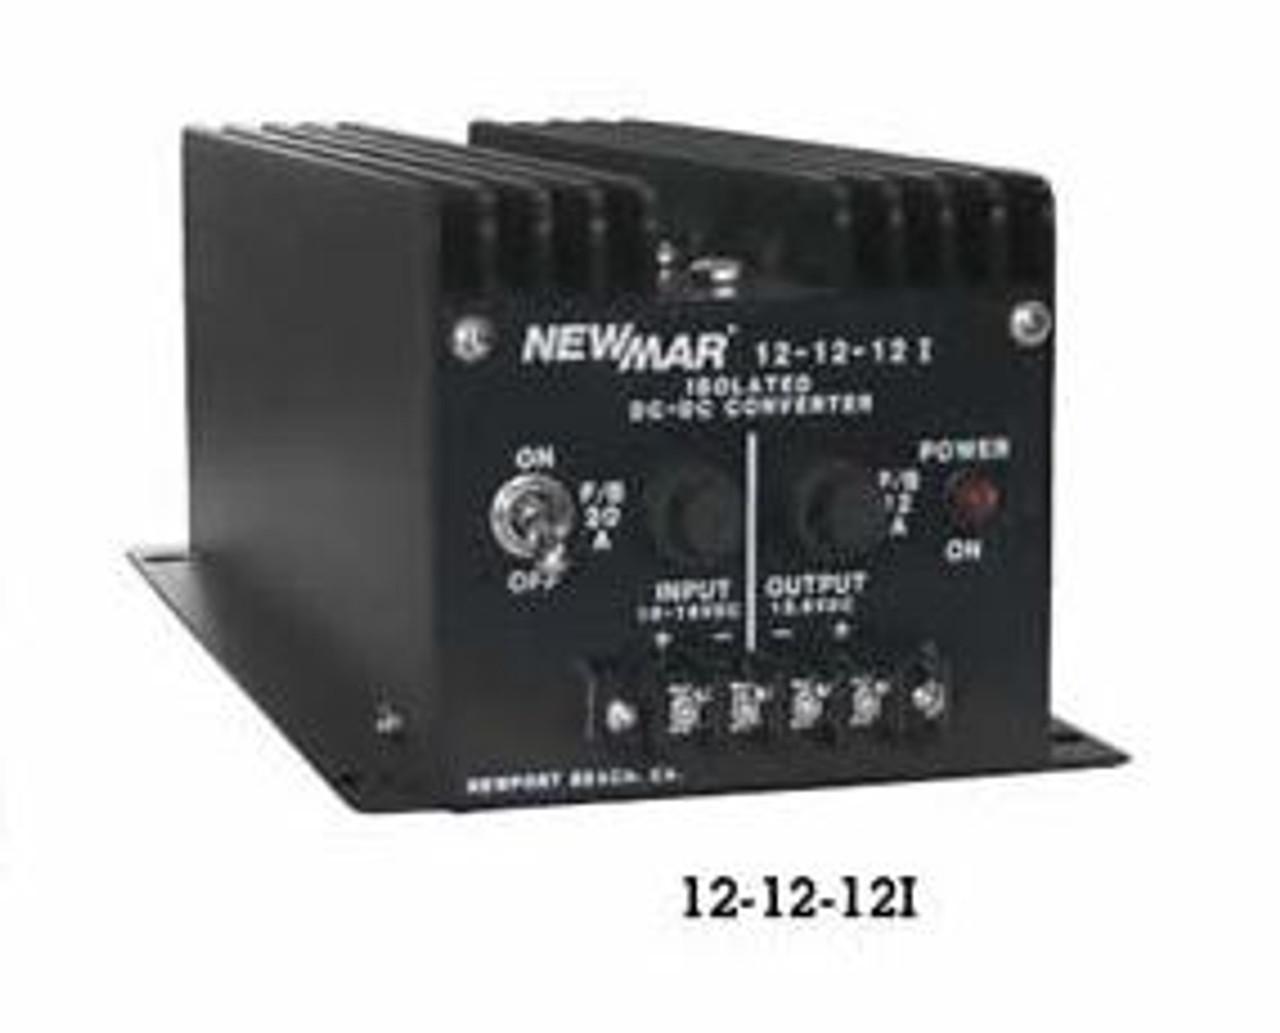 Newmar 12-12-6i 12 Volt 6 Amp Power Stabilizer